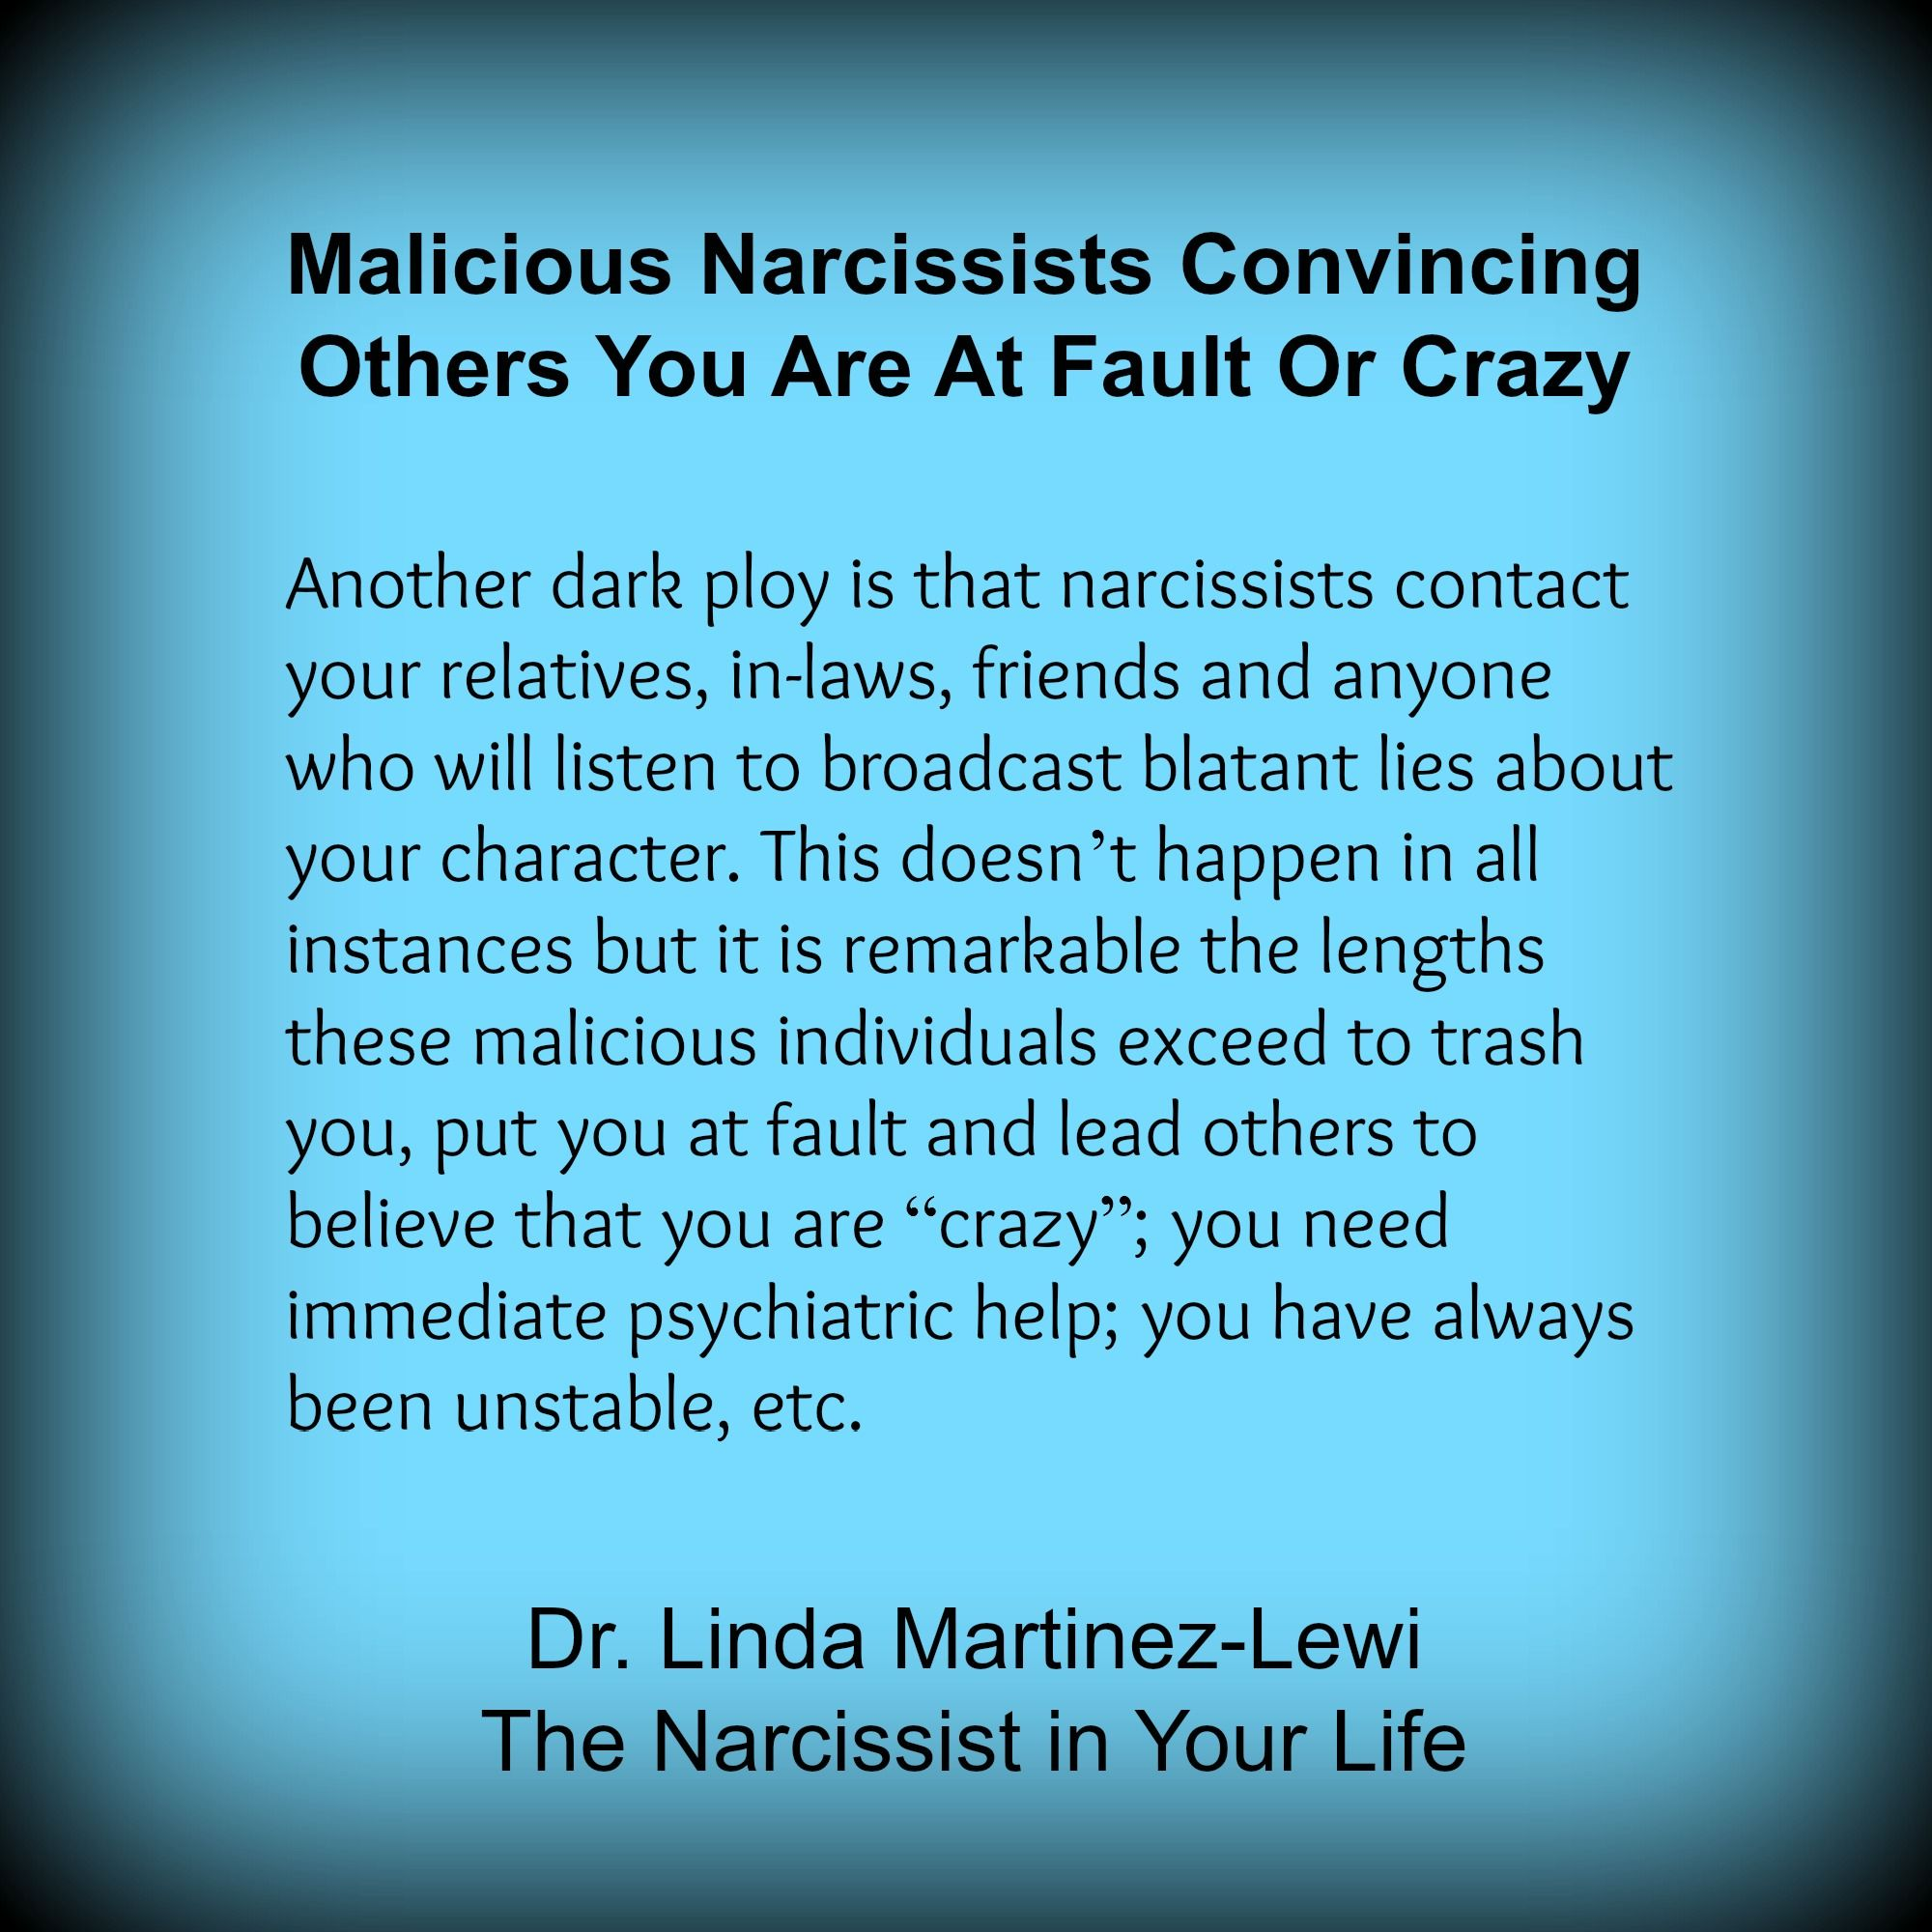 Malicious narcissism